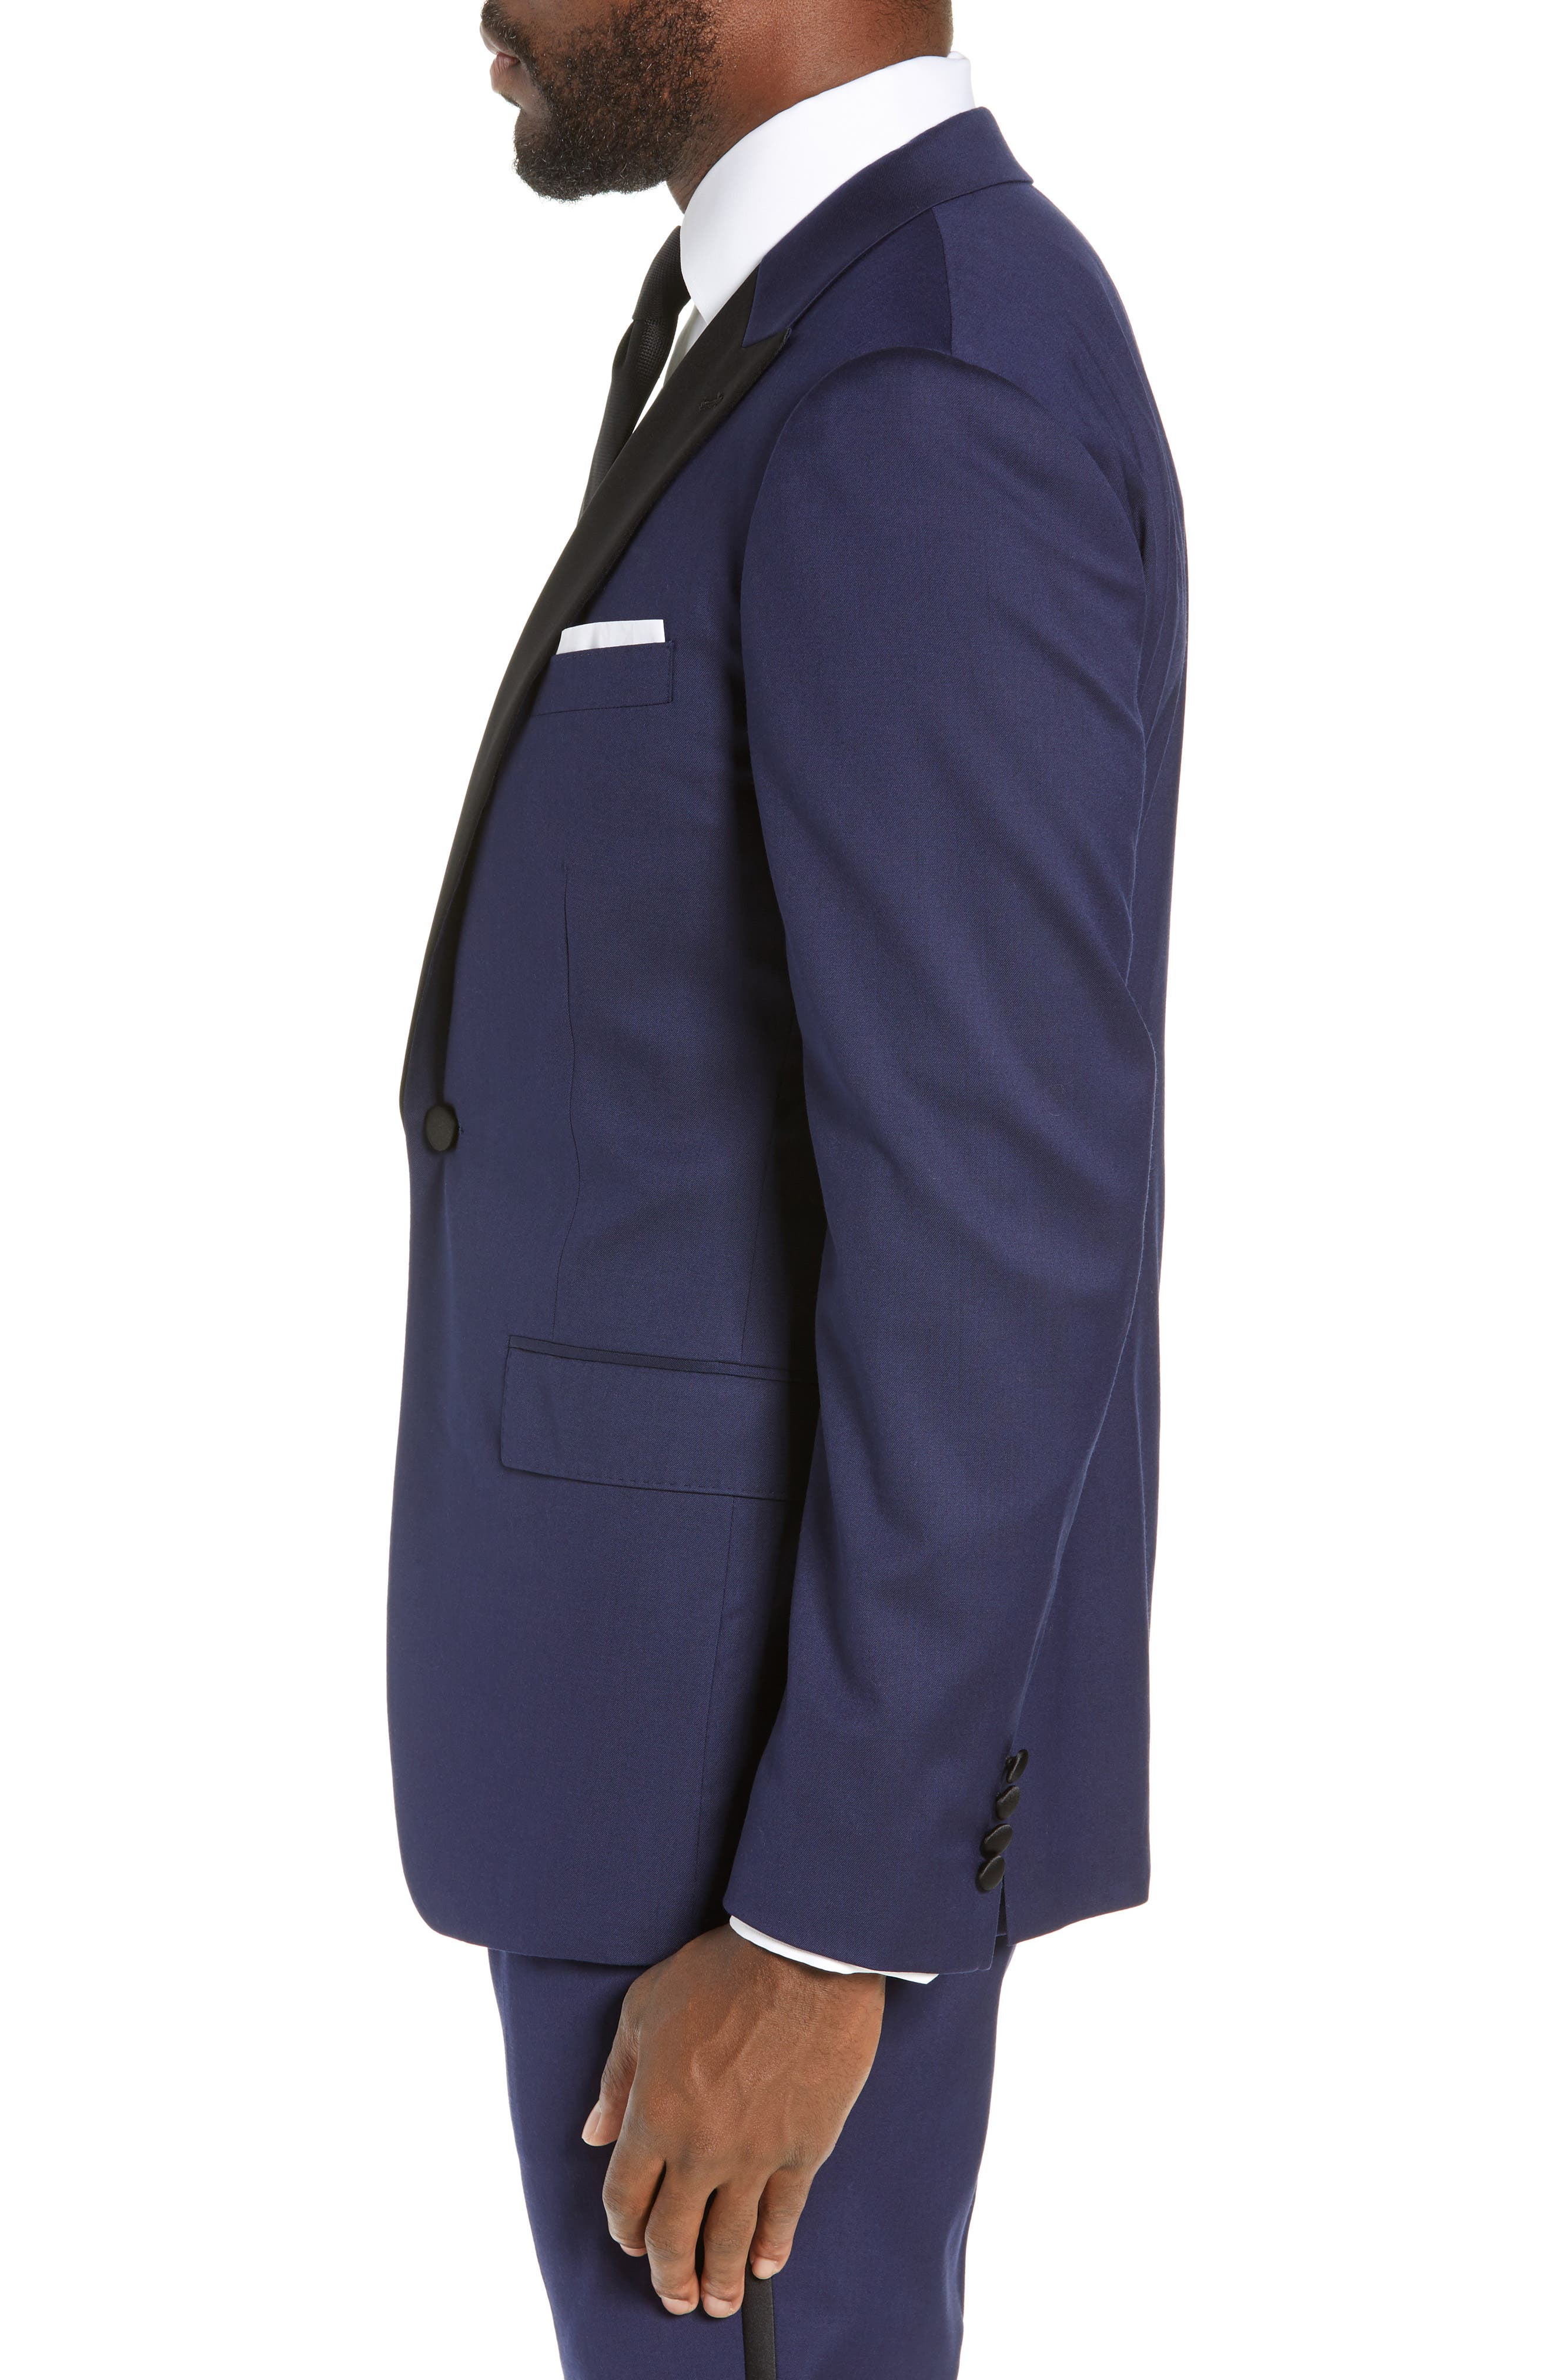 Capstone Slim Fit Italian Wool Blend Dinner Jacket,                             Alternate thumbnail 3, color,                             NAVY